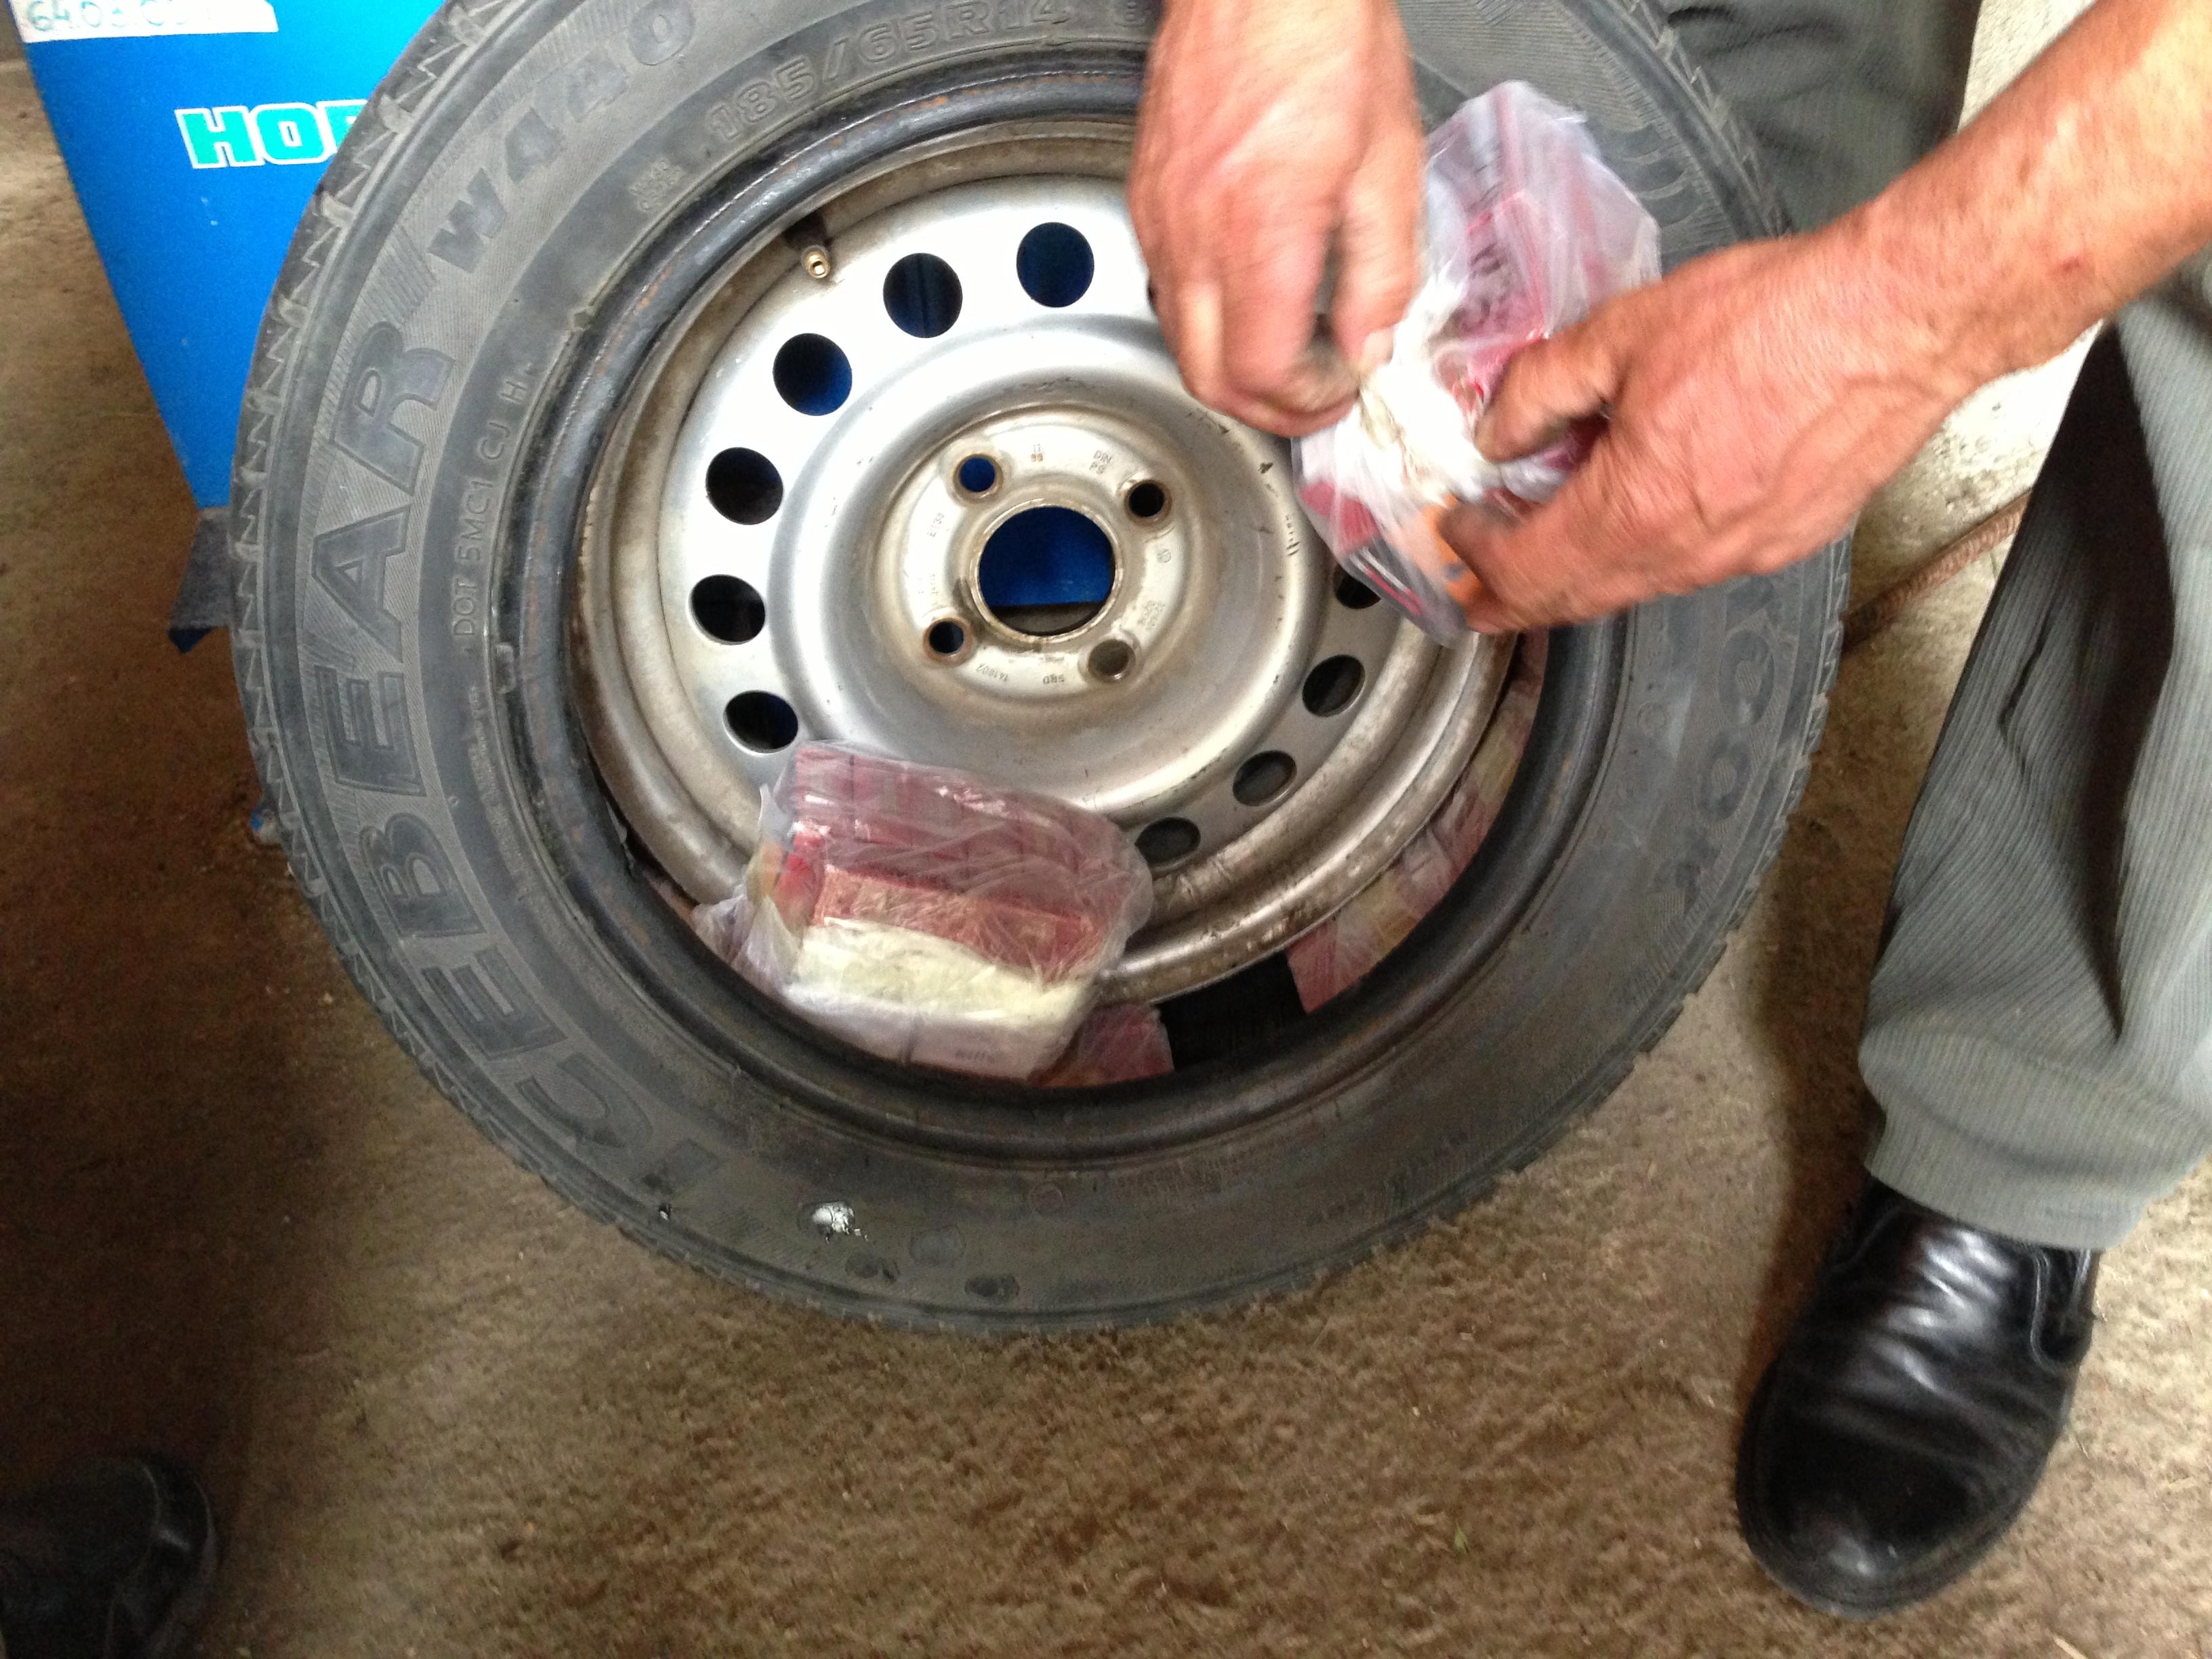 Politistii de frontiera au gasit 500 de pachete de tigari de contrabanda in rotile unei masini. FOTO